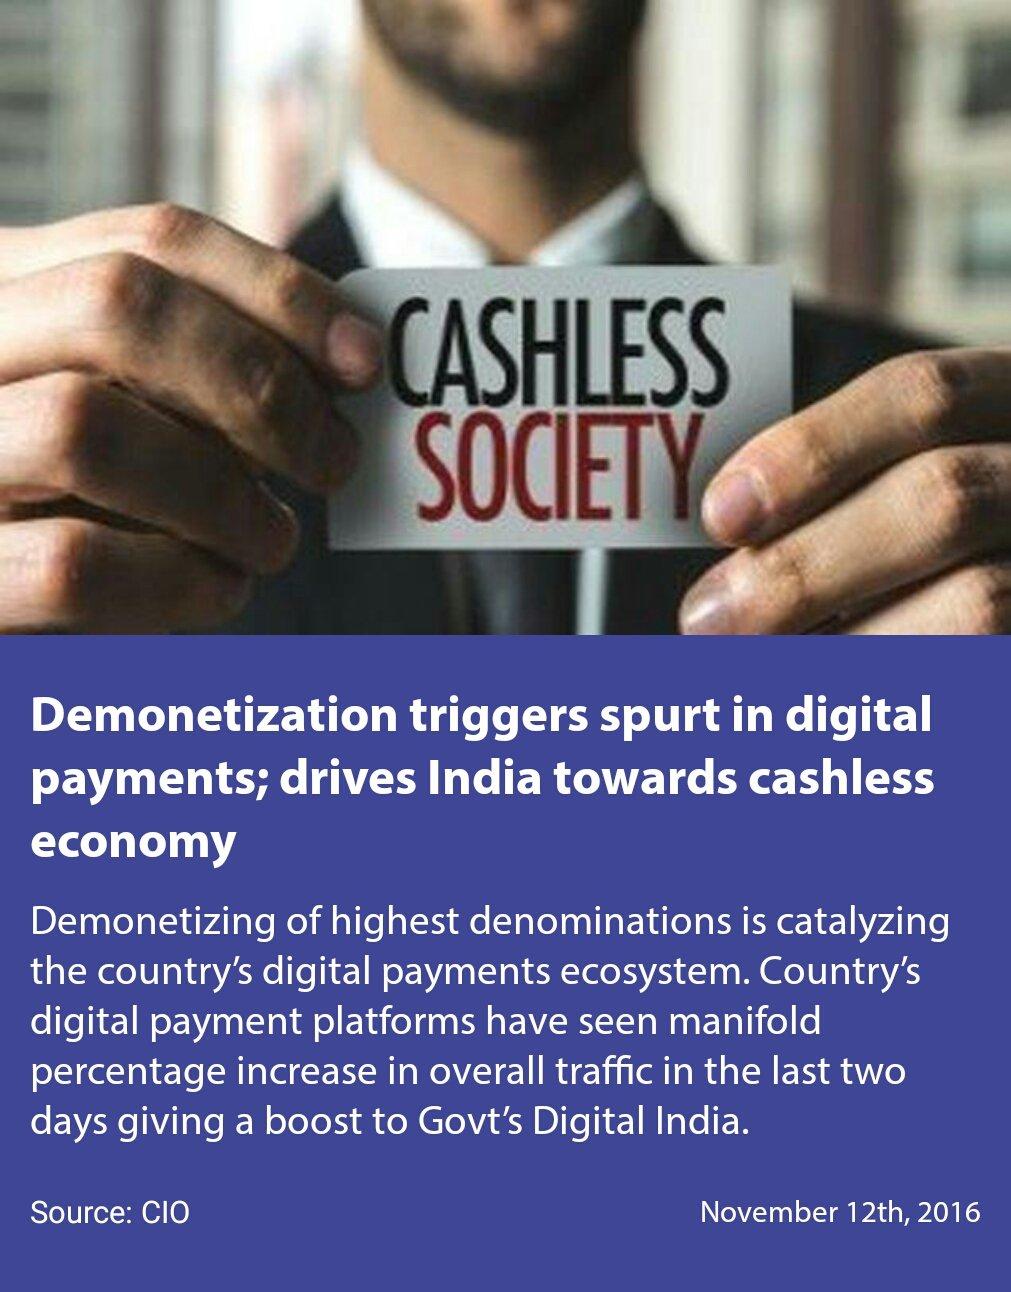 Demonetization triggers spurt in digital payments; drives India towards #CashlessEconomy. #TransformingIndia   https://t.co/XbEicynb2e https://t.co/5U2sosM4Kk